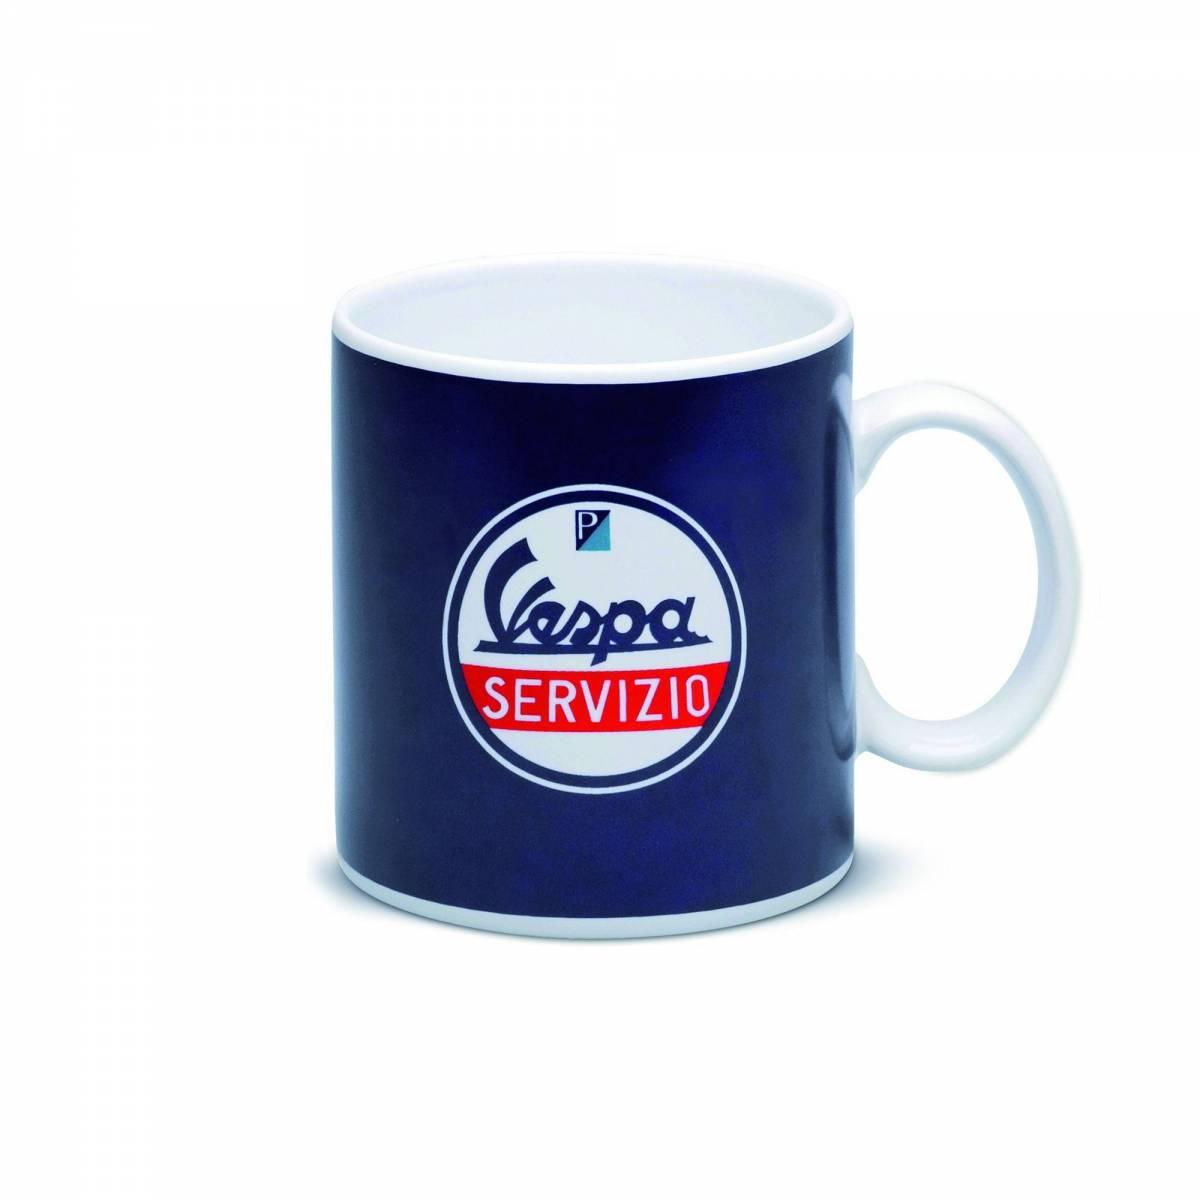 Vespa - Mug en Céramique Servizio - Bleu